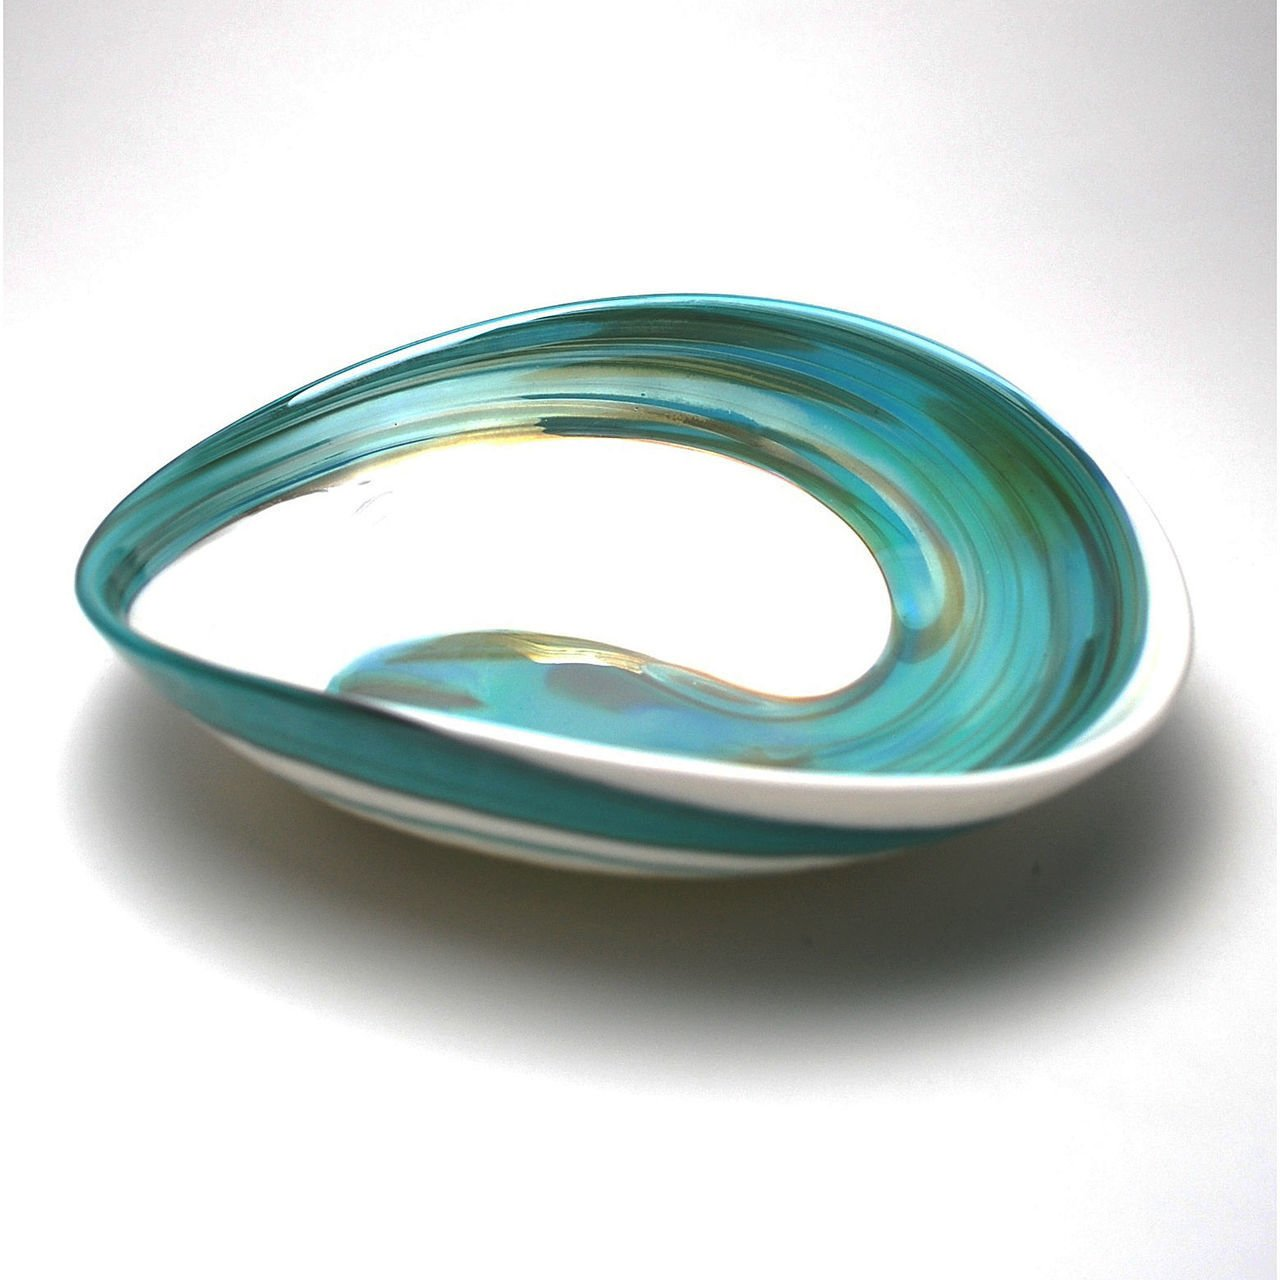 HOME DECOR - ''AEGEAN SEA'' MURANO GLASS TRAY - IVORY / TEAL GREEN - 7'' X 5''